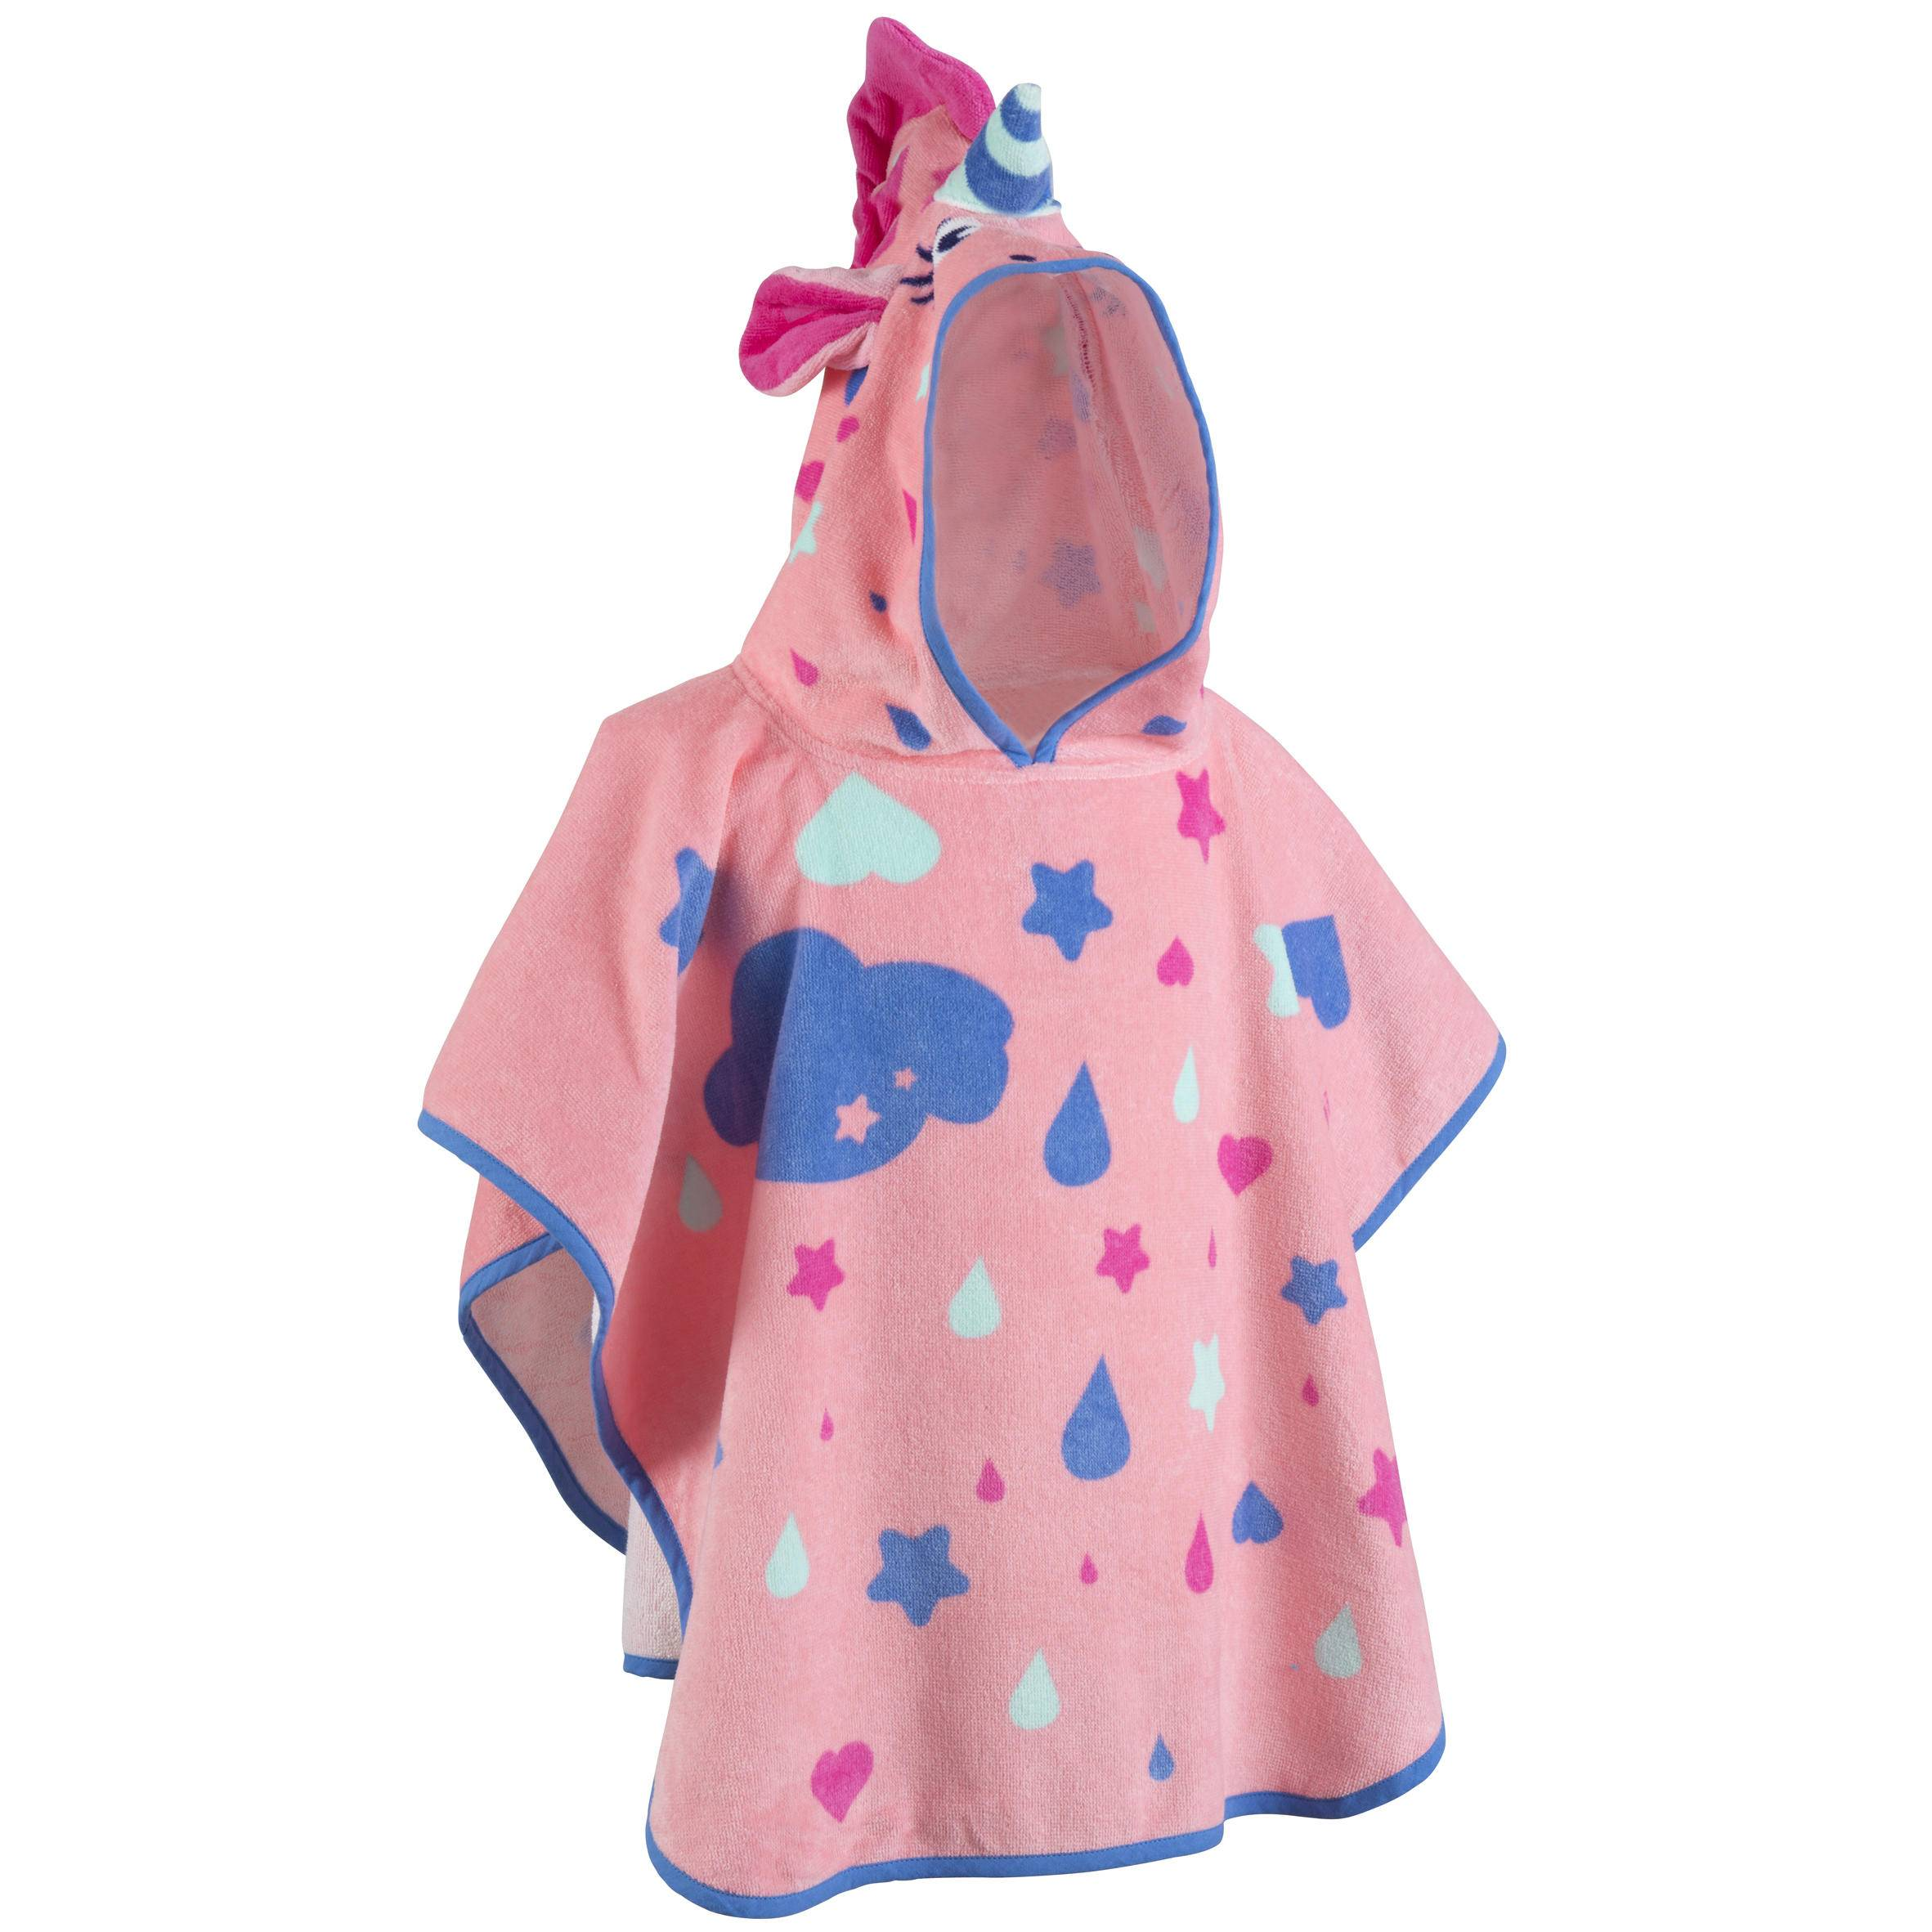 Nabaiji Poncho bébé avec capuche rose imprimé Licorne - Nabaiji